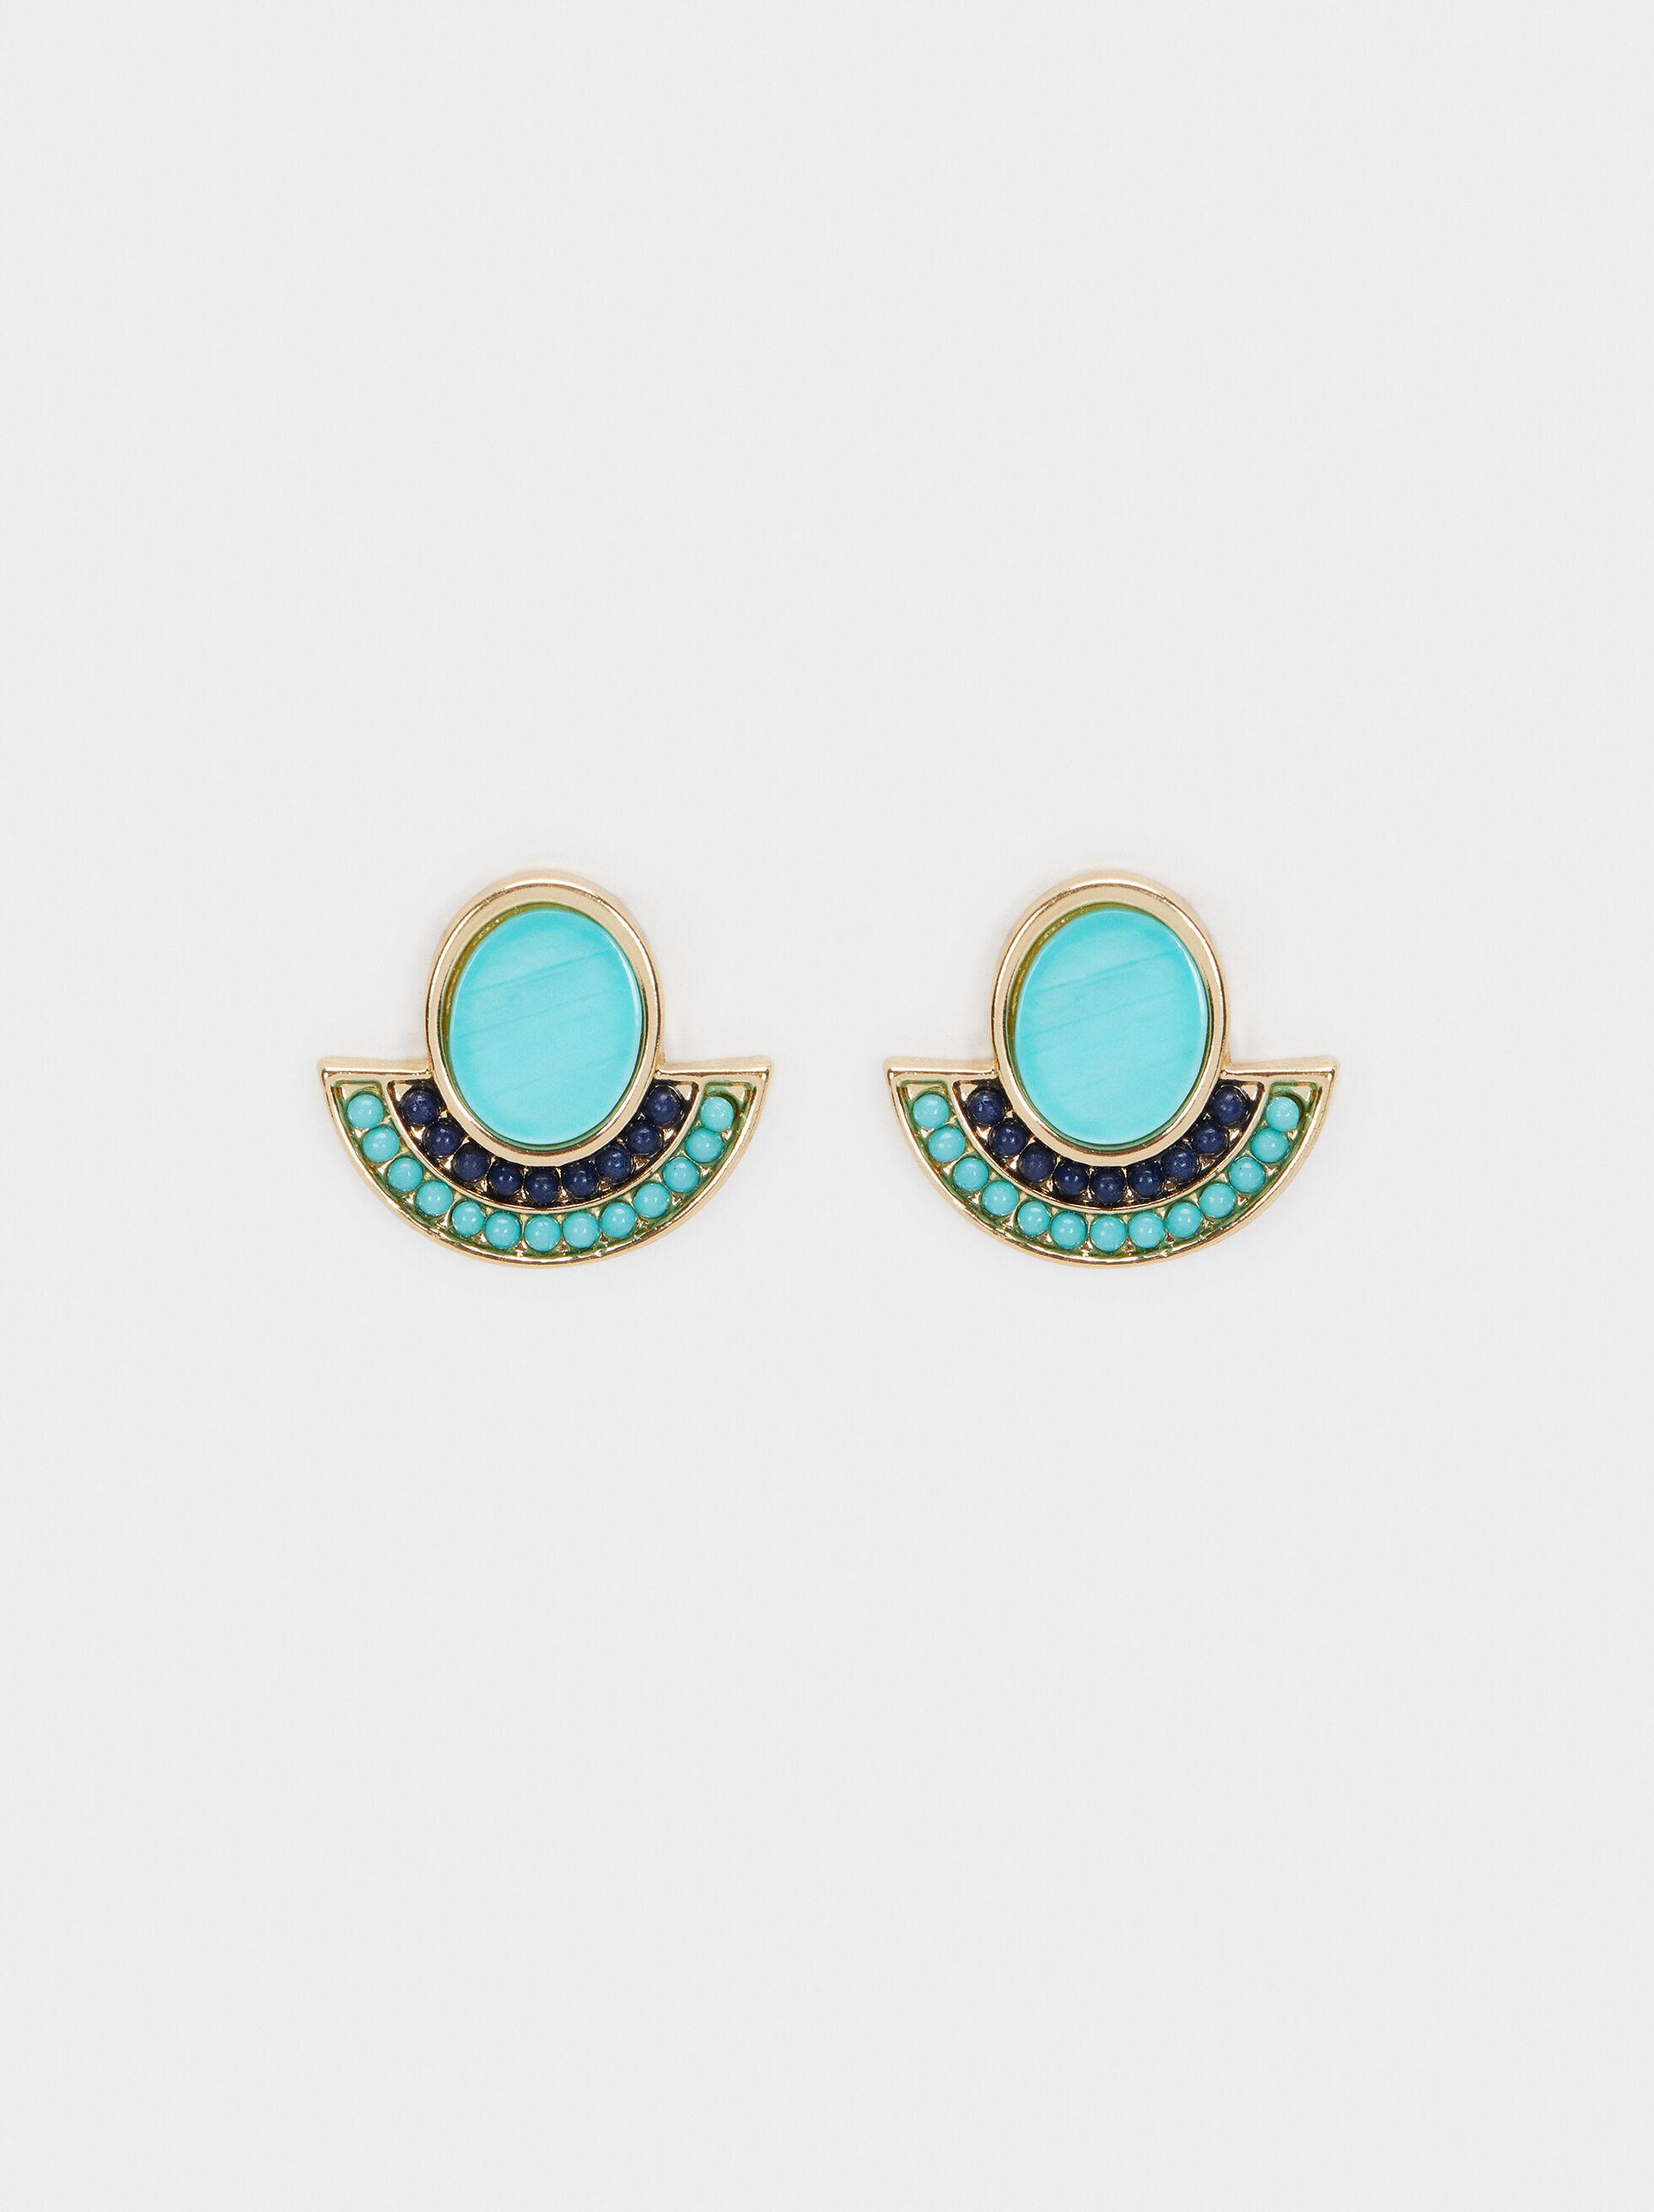 Recife Stud Earrings, Multicolor, hi-res